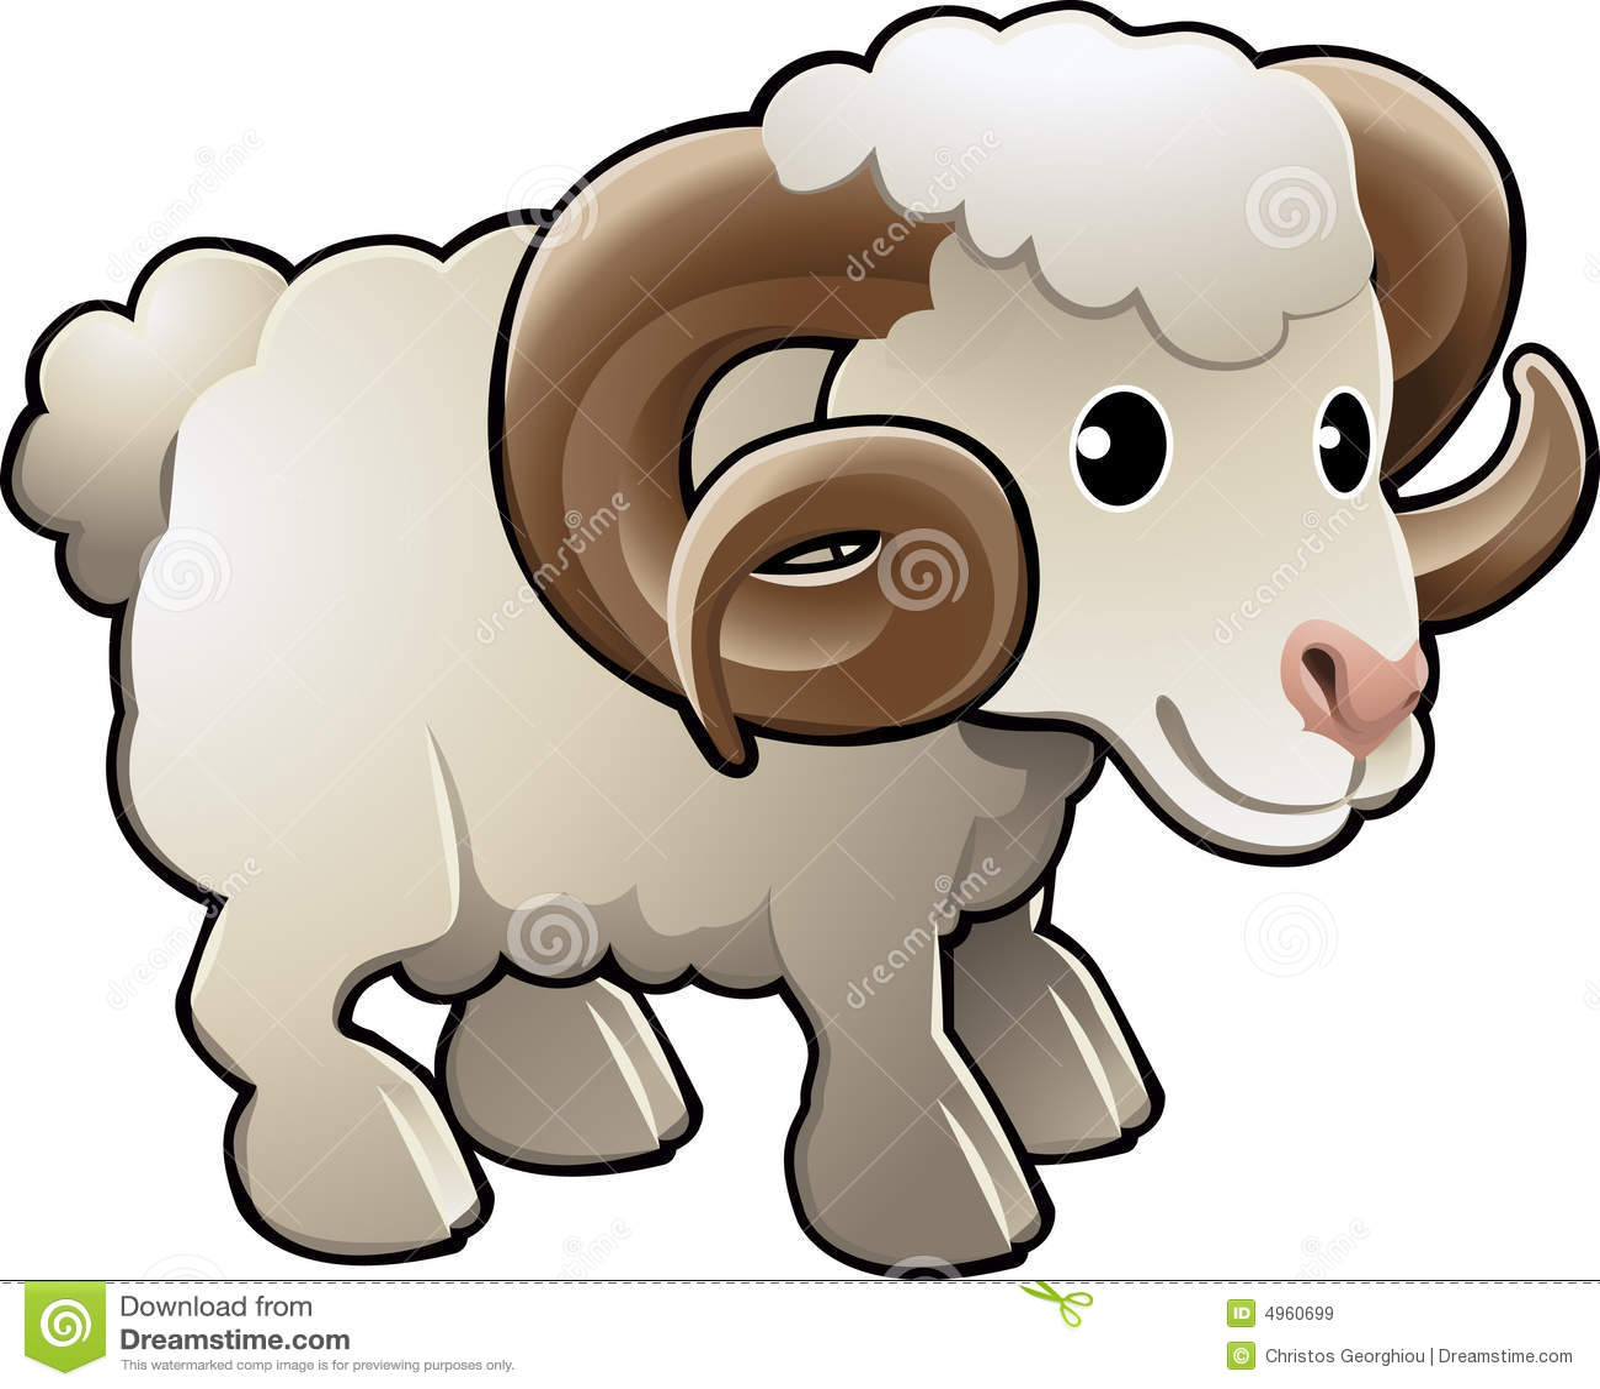 Cute Ram Sheep Farm Animal Vector